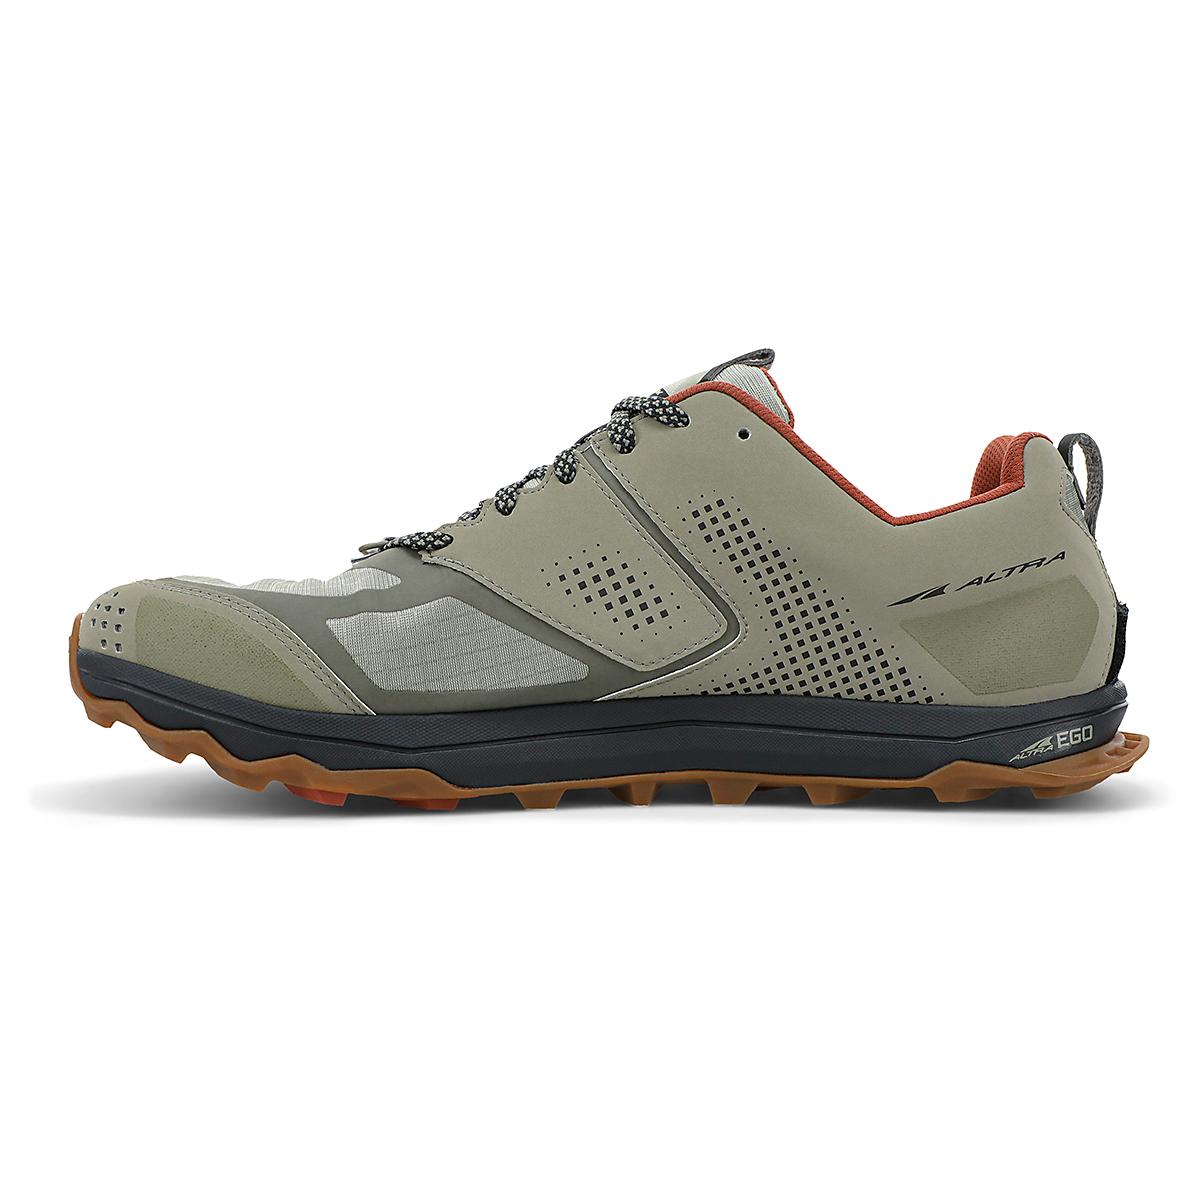 Men's Altra Lone Peak 5 Trail Running Shoe - Color: Khaki - Size: 7 - Width: Regular, Khaki, large, image 2